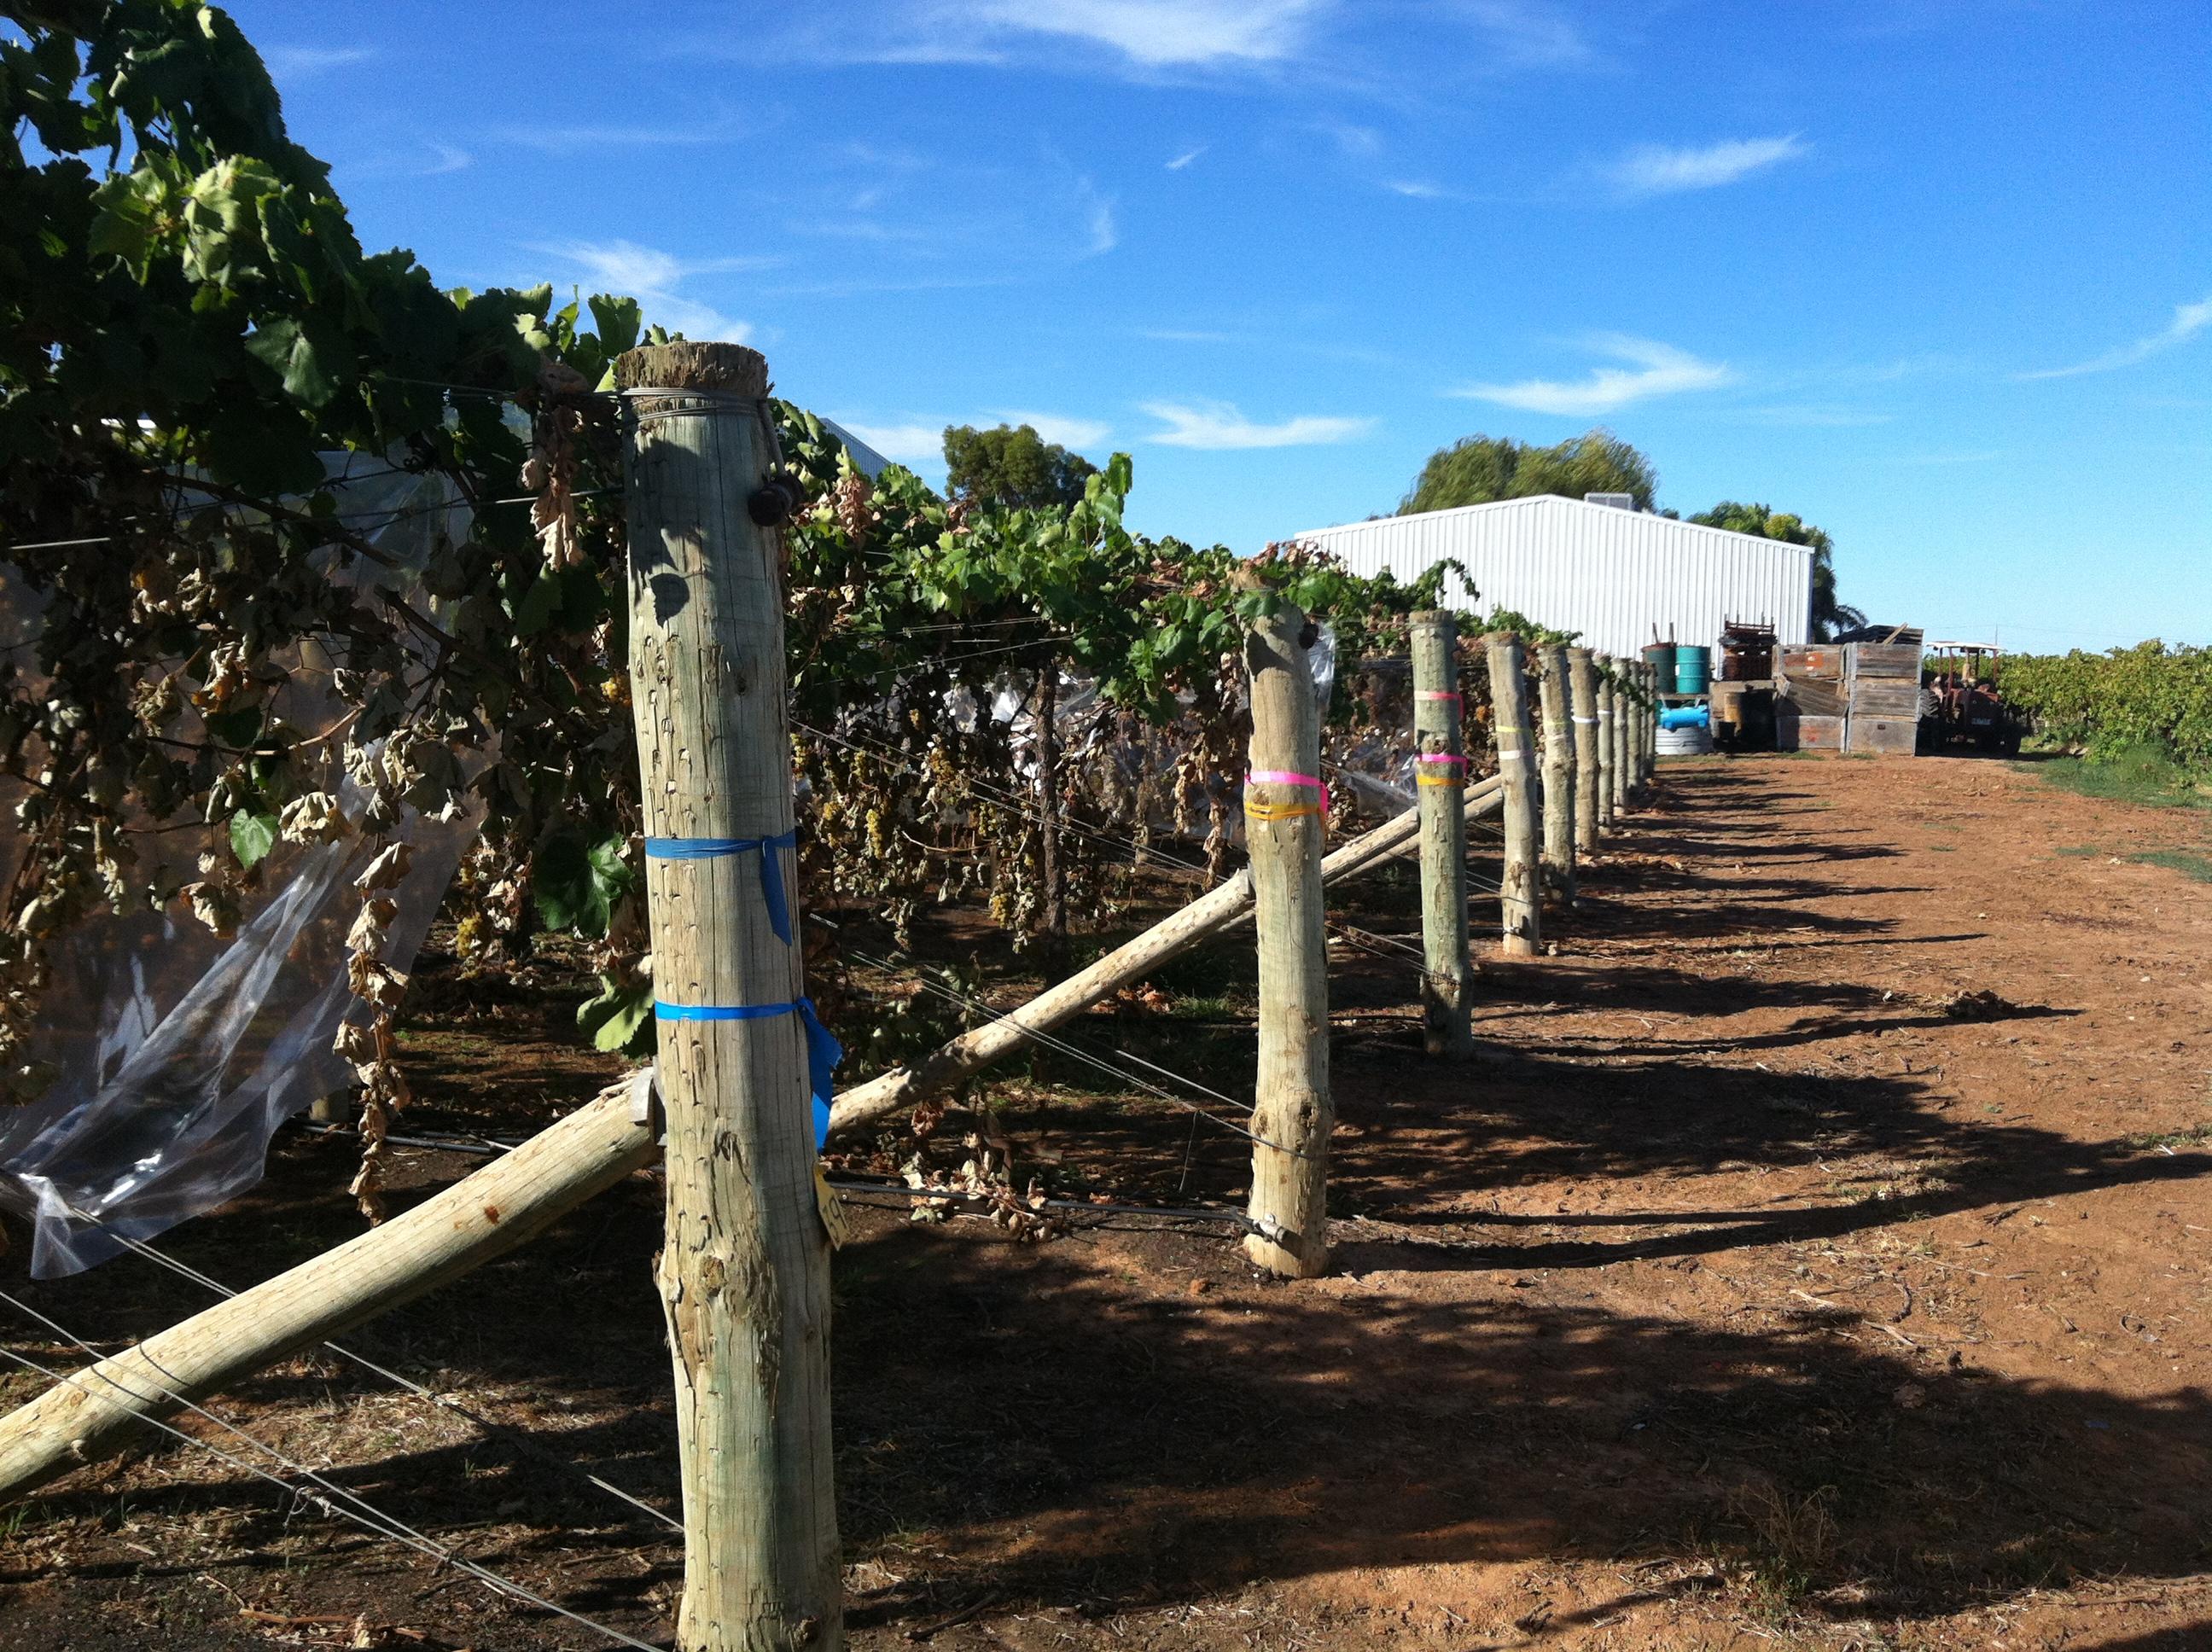 Vine cover trials (4)